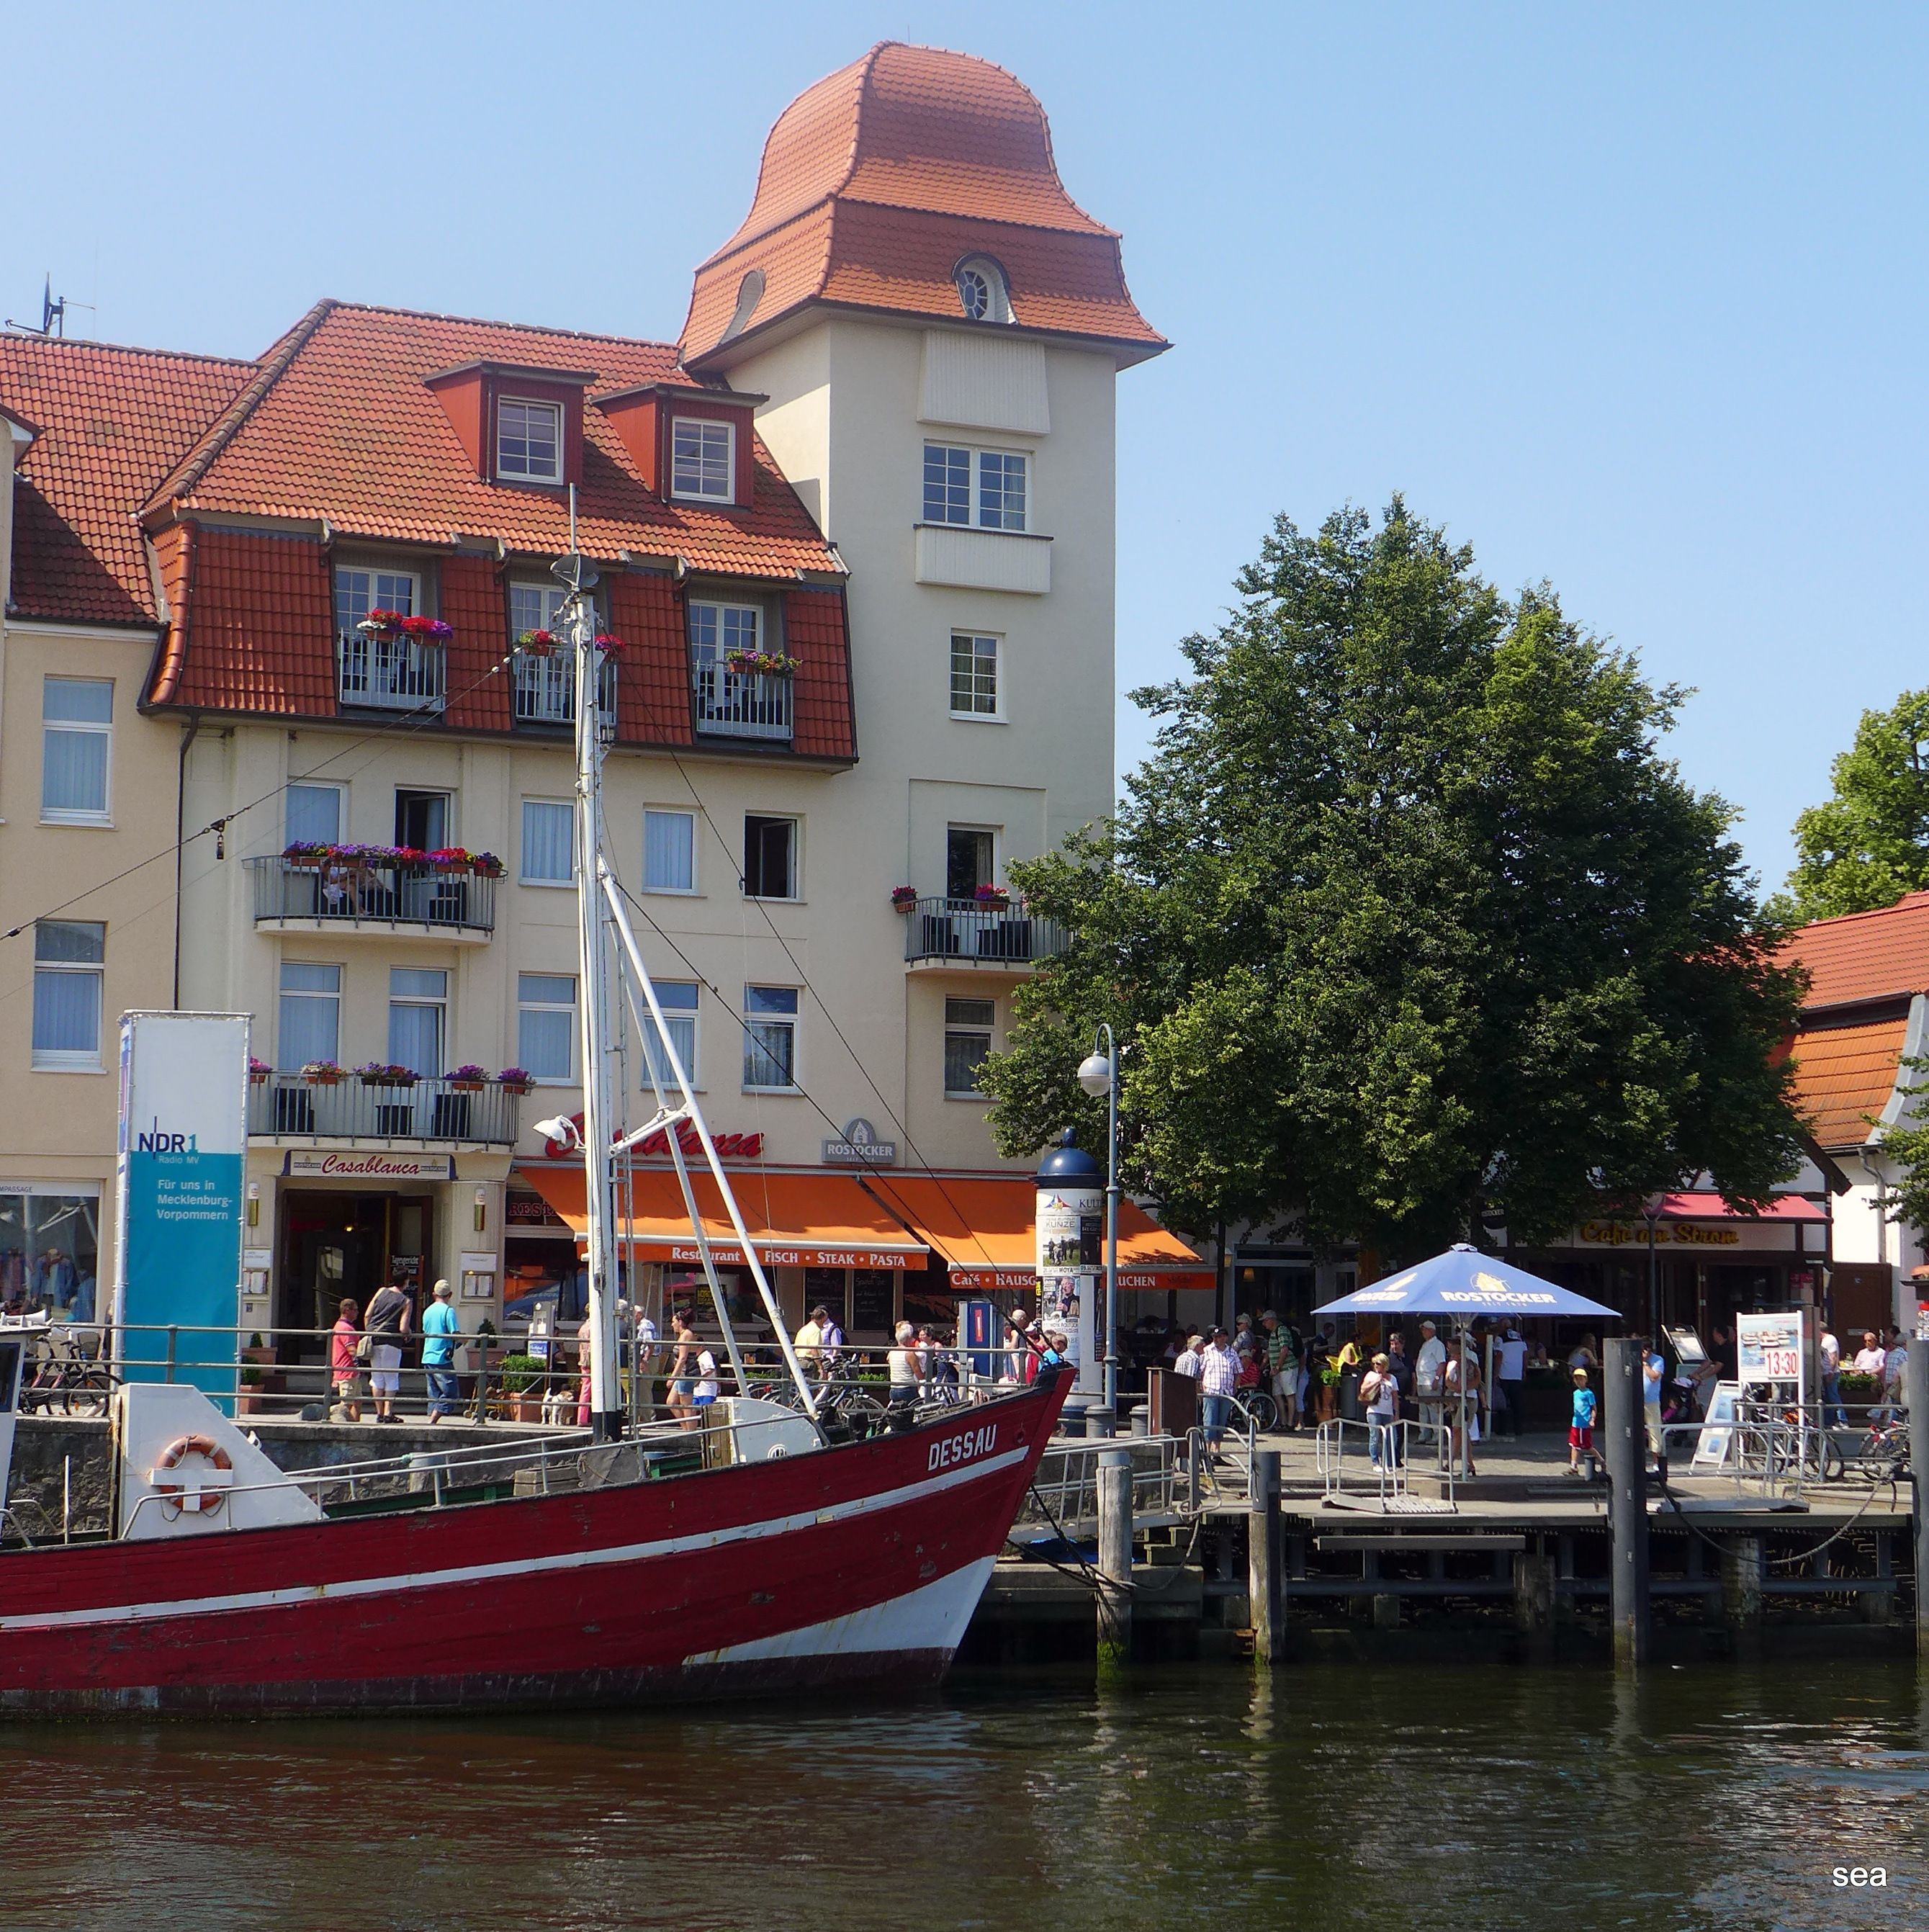 Places Spaces: Warnemünde, Rostock, Germany